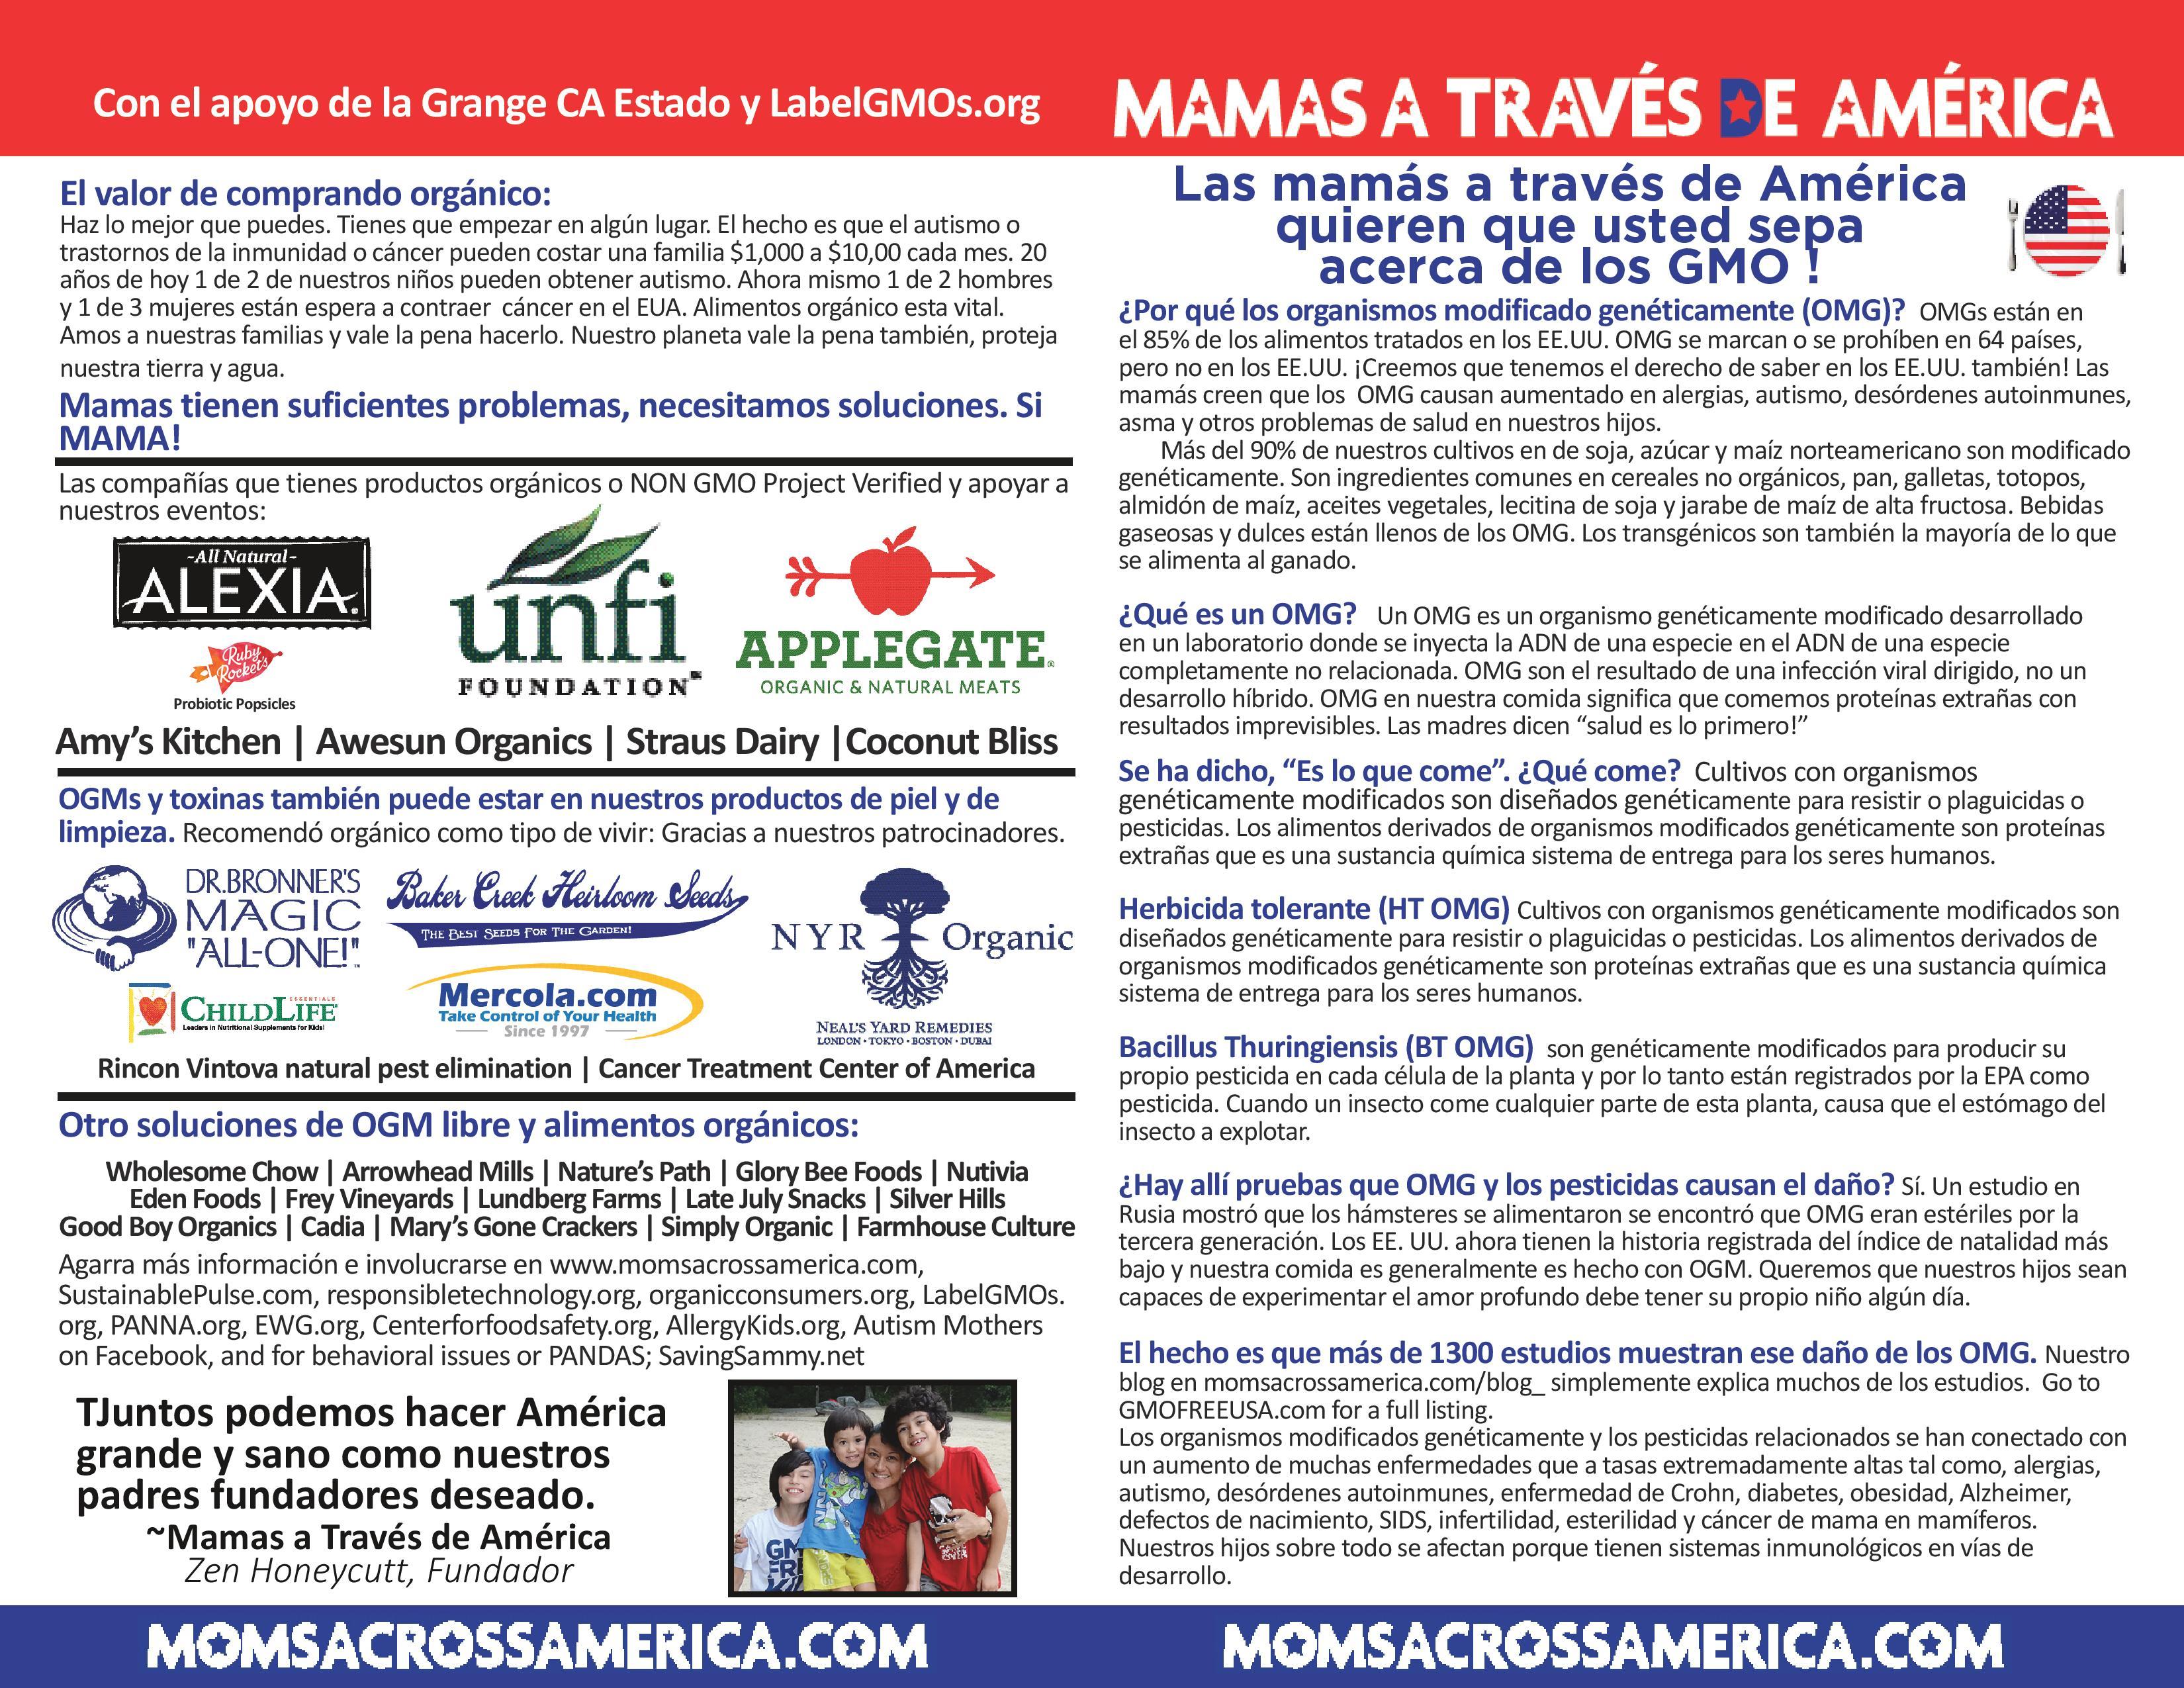 brochure-spanish-1-page-final.jpg